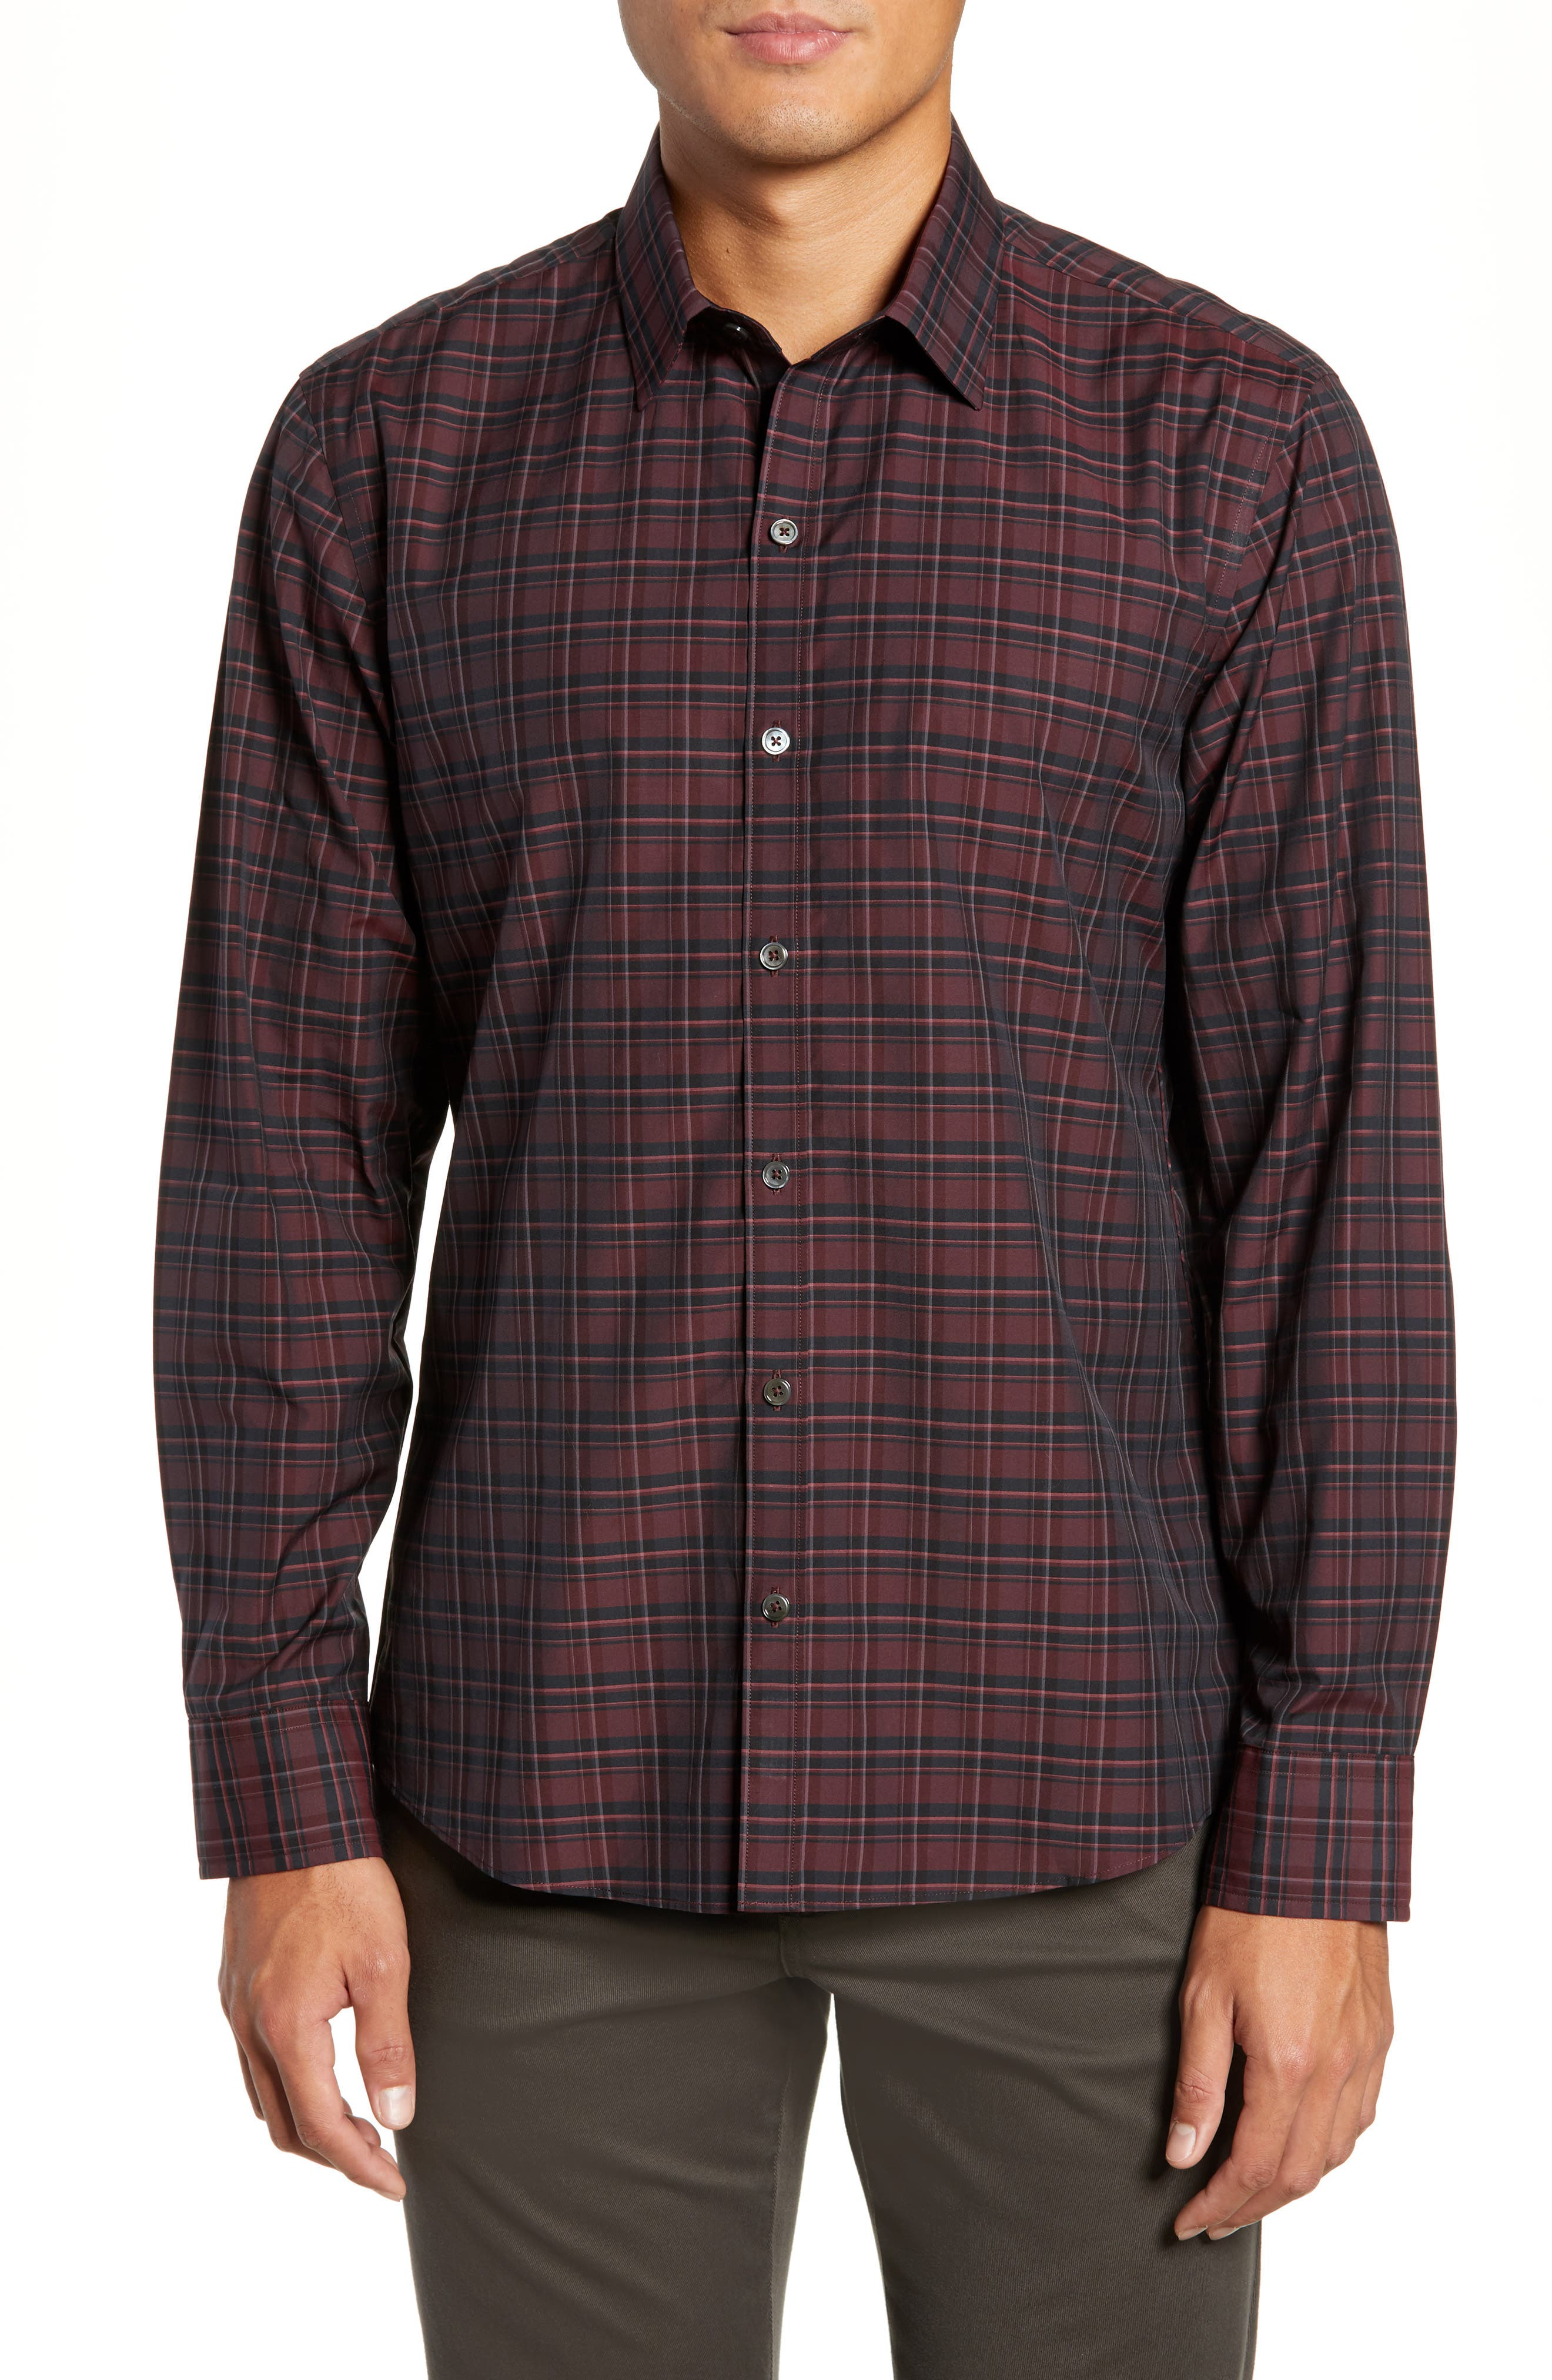 ZACHARY PRELL, Sunny Regular Fit Sport Shirt, Main thumbnail 1, color, RUBY